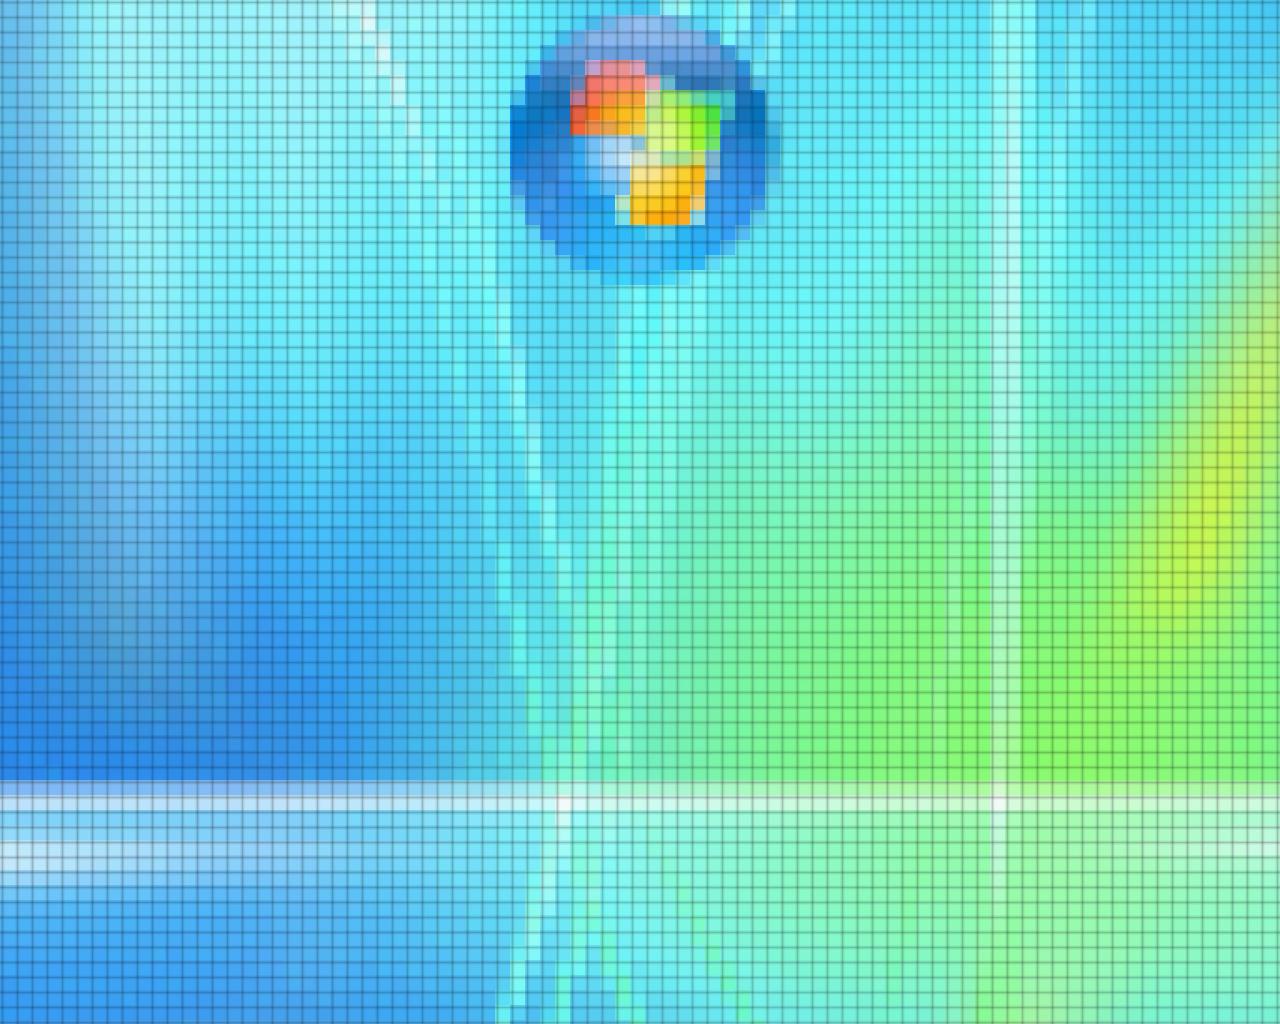 Windows XP Wallpaper 1280x1024 Windows XP Pixelation 1280x1024